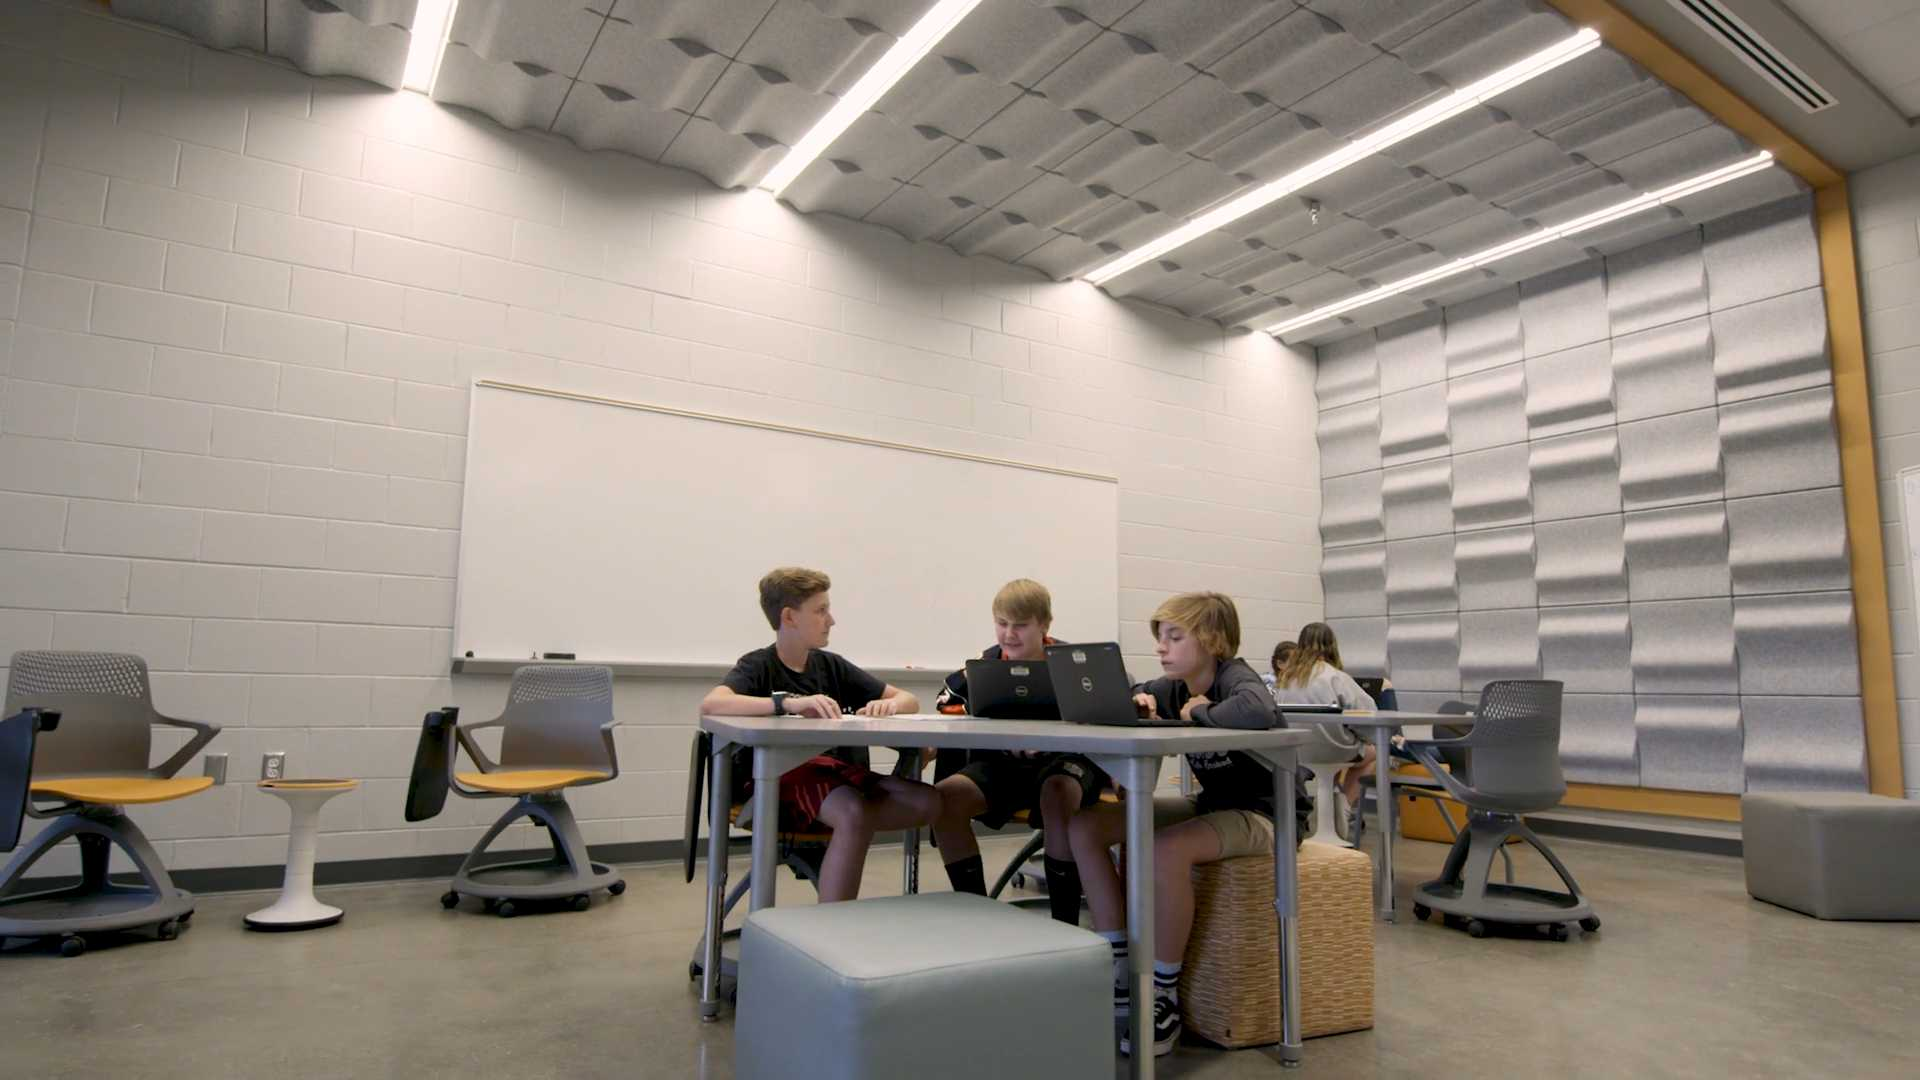 Moseley Architects – Powhatan High School